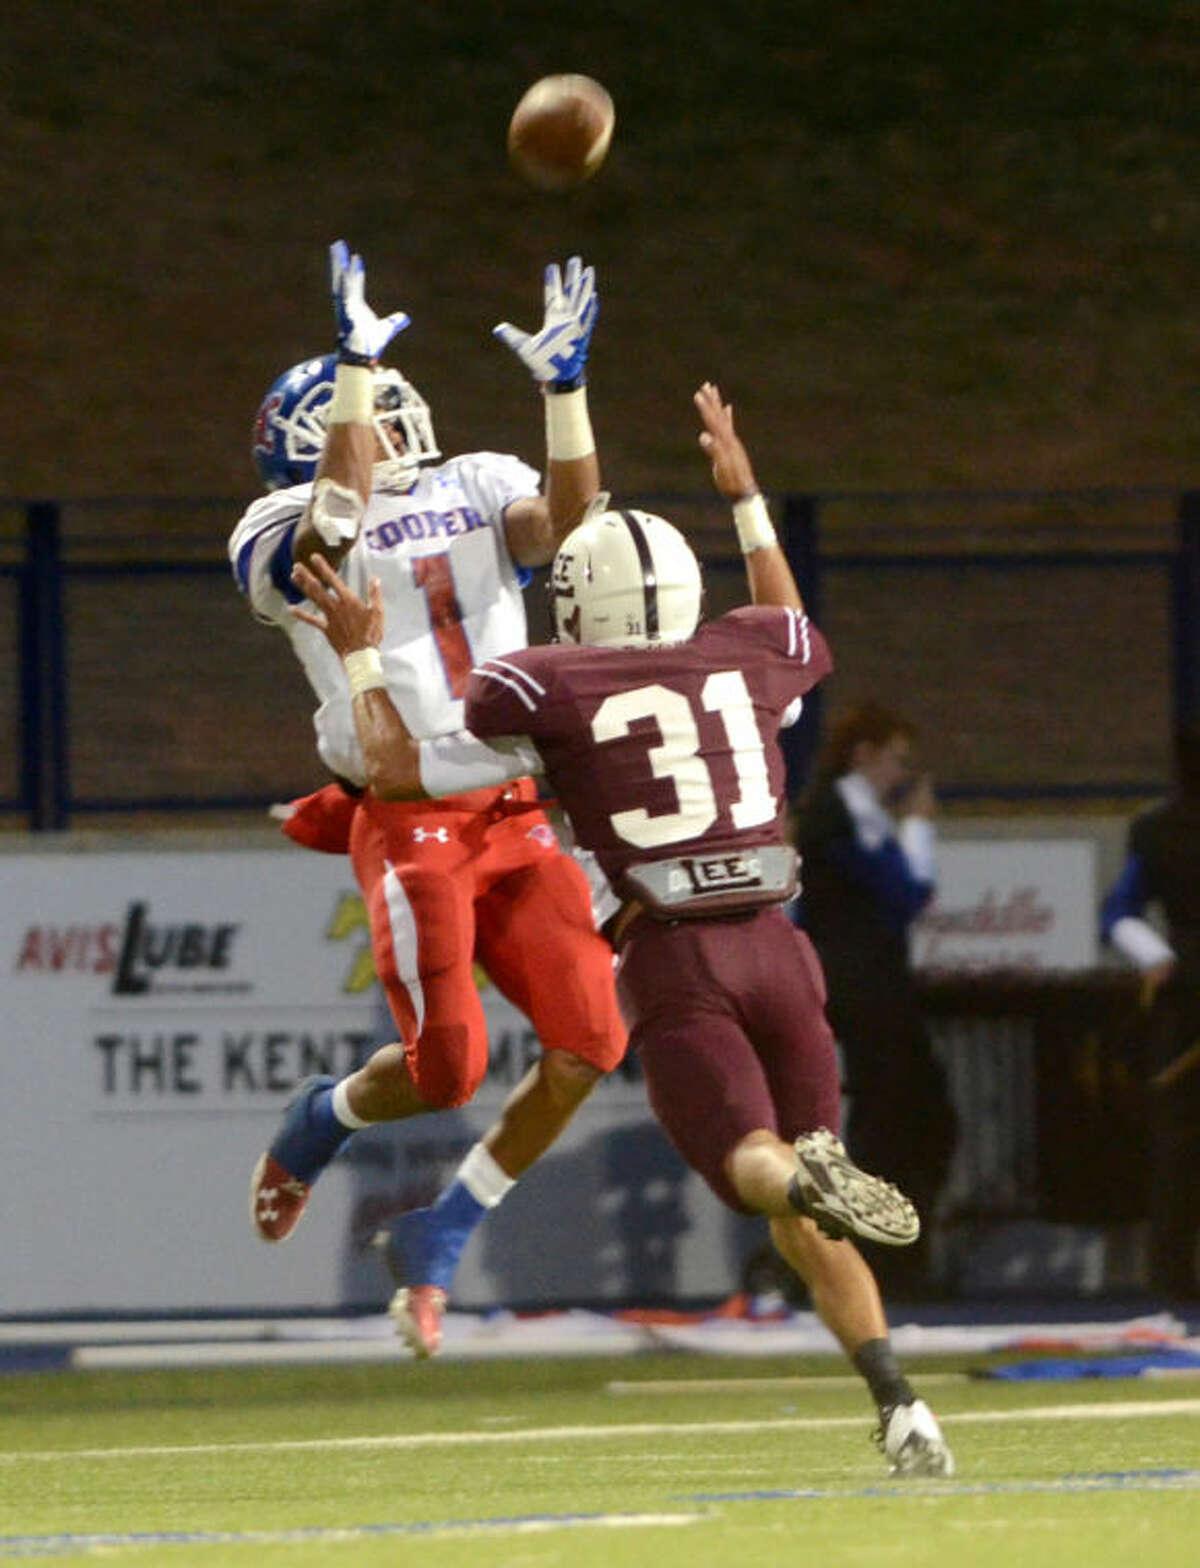 Lee's Anthony Navarrete tries to break up a pass intended for Abilene Cooper's Trey Dye on Friday at Grande Communications Stadium. James Durbin/Reporter-Telegram